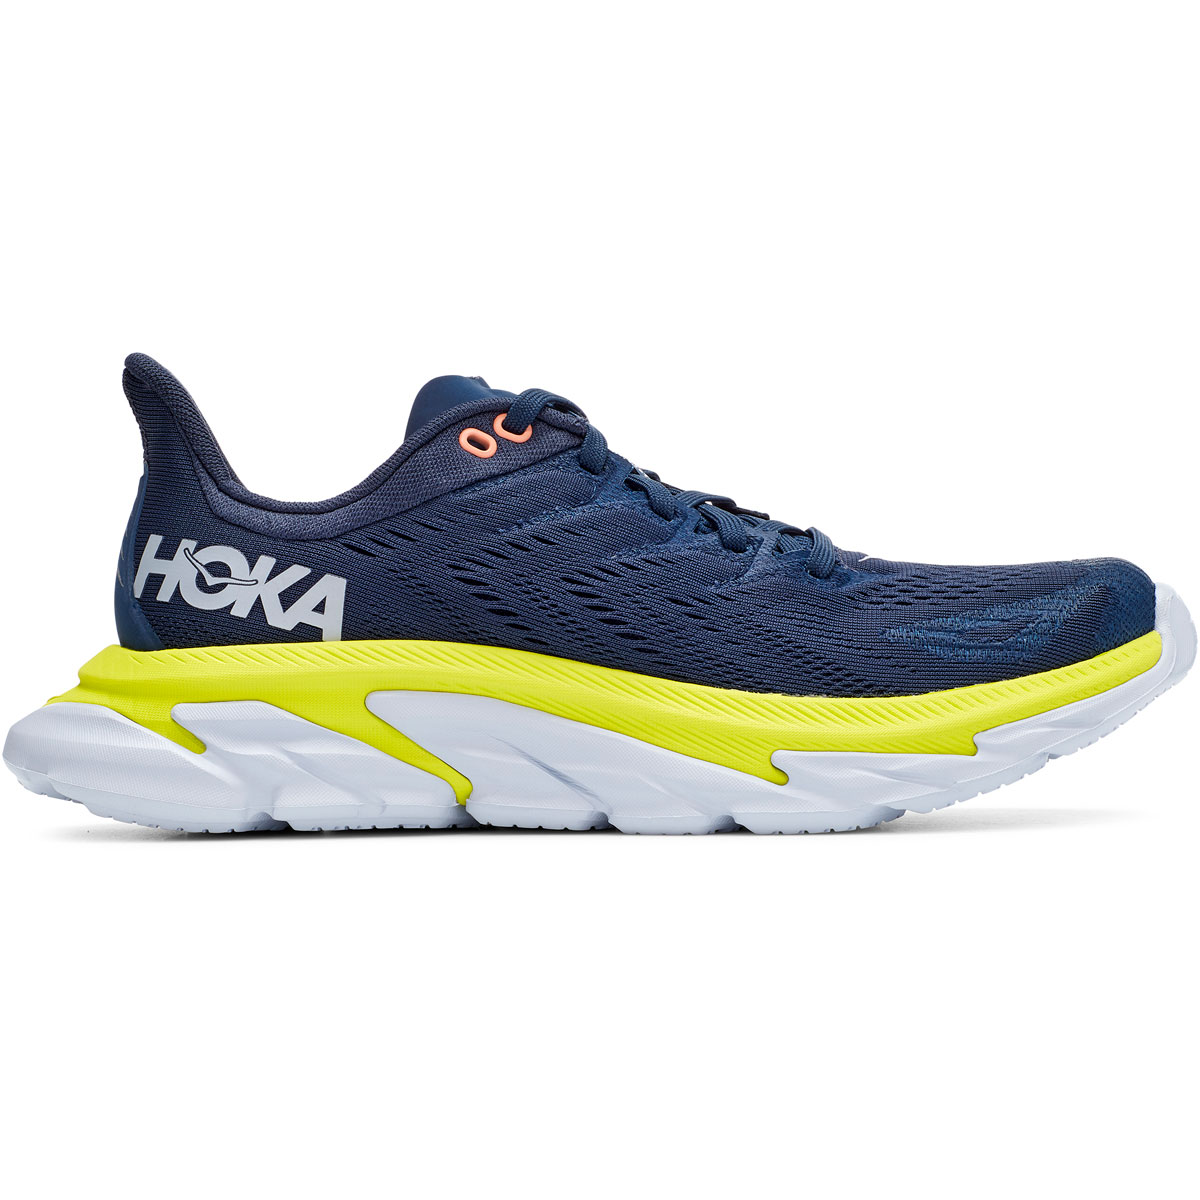 Women's Hoka One One Clifton Edge Running Shoe - Color: Moonlit Ocean/Evening Primrose - Size: 5 - Width: Regular, Moonlit Ocean/Evening Primrose, large, image 1